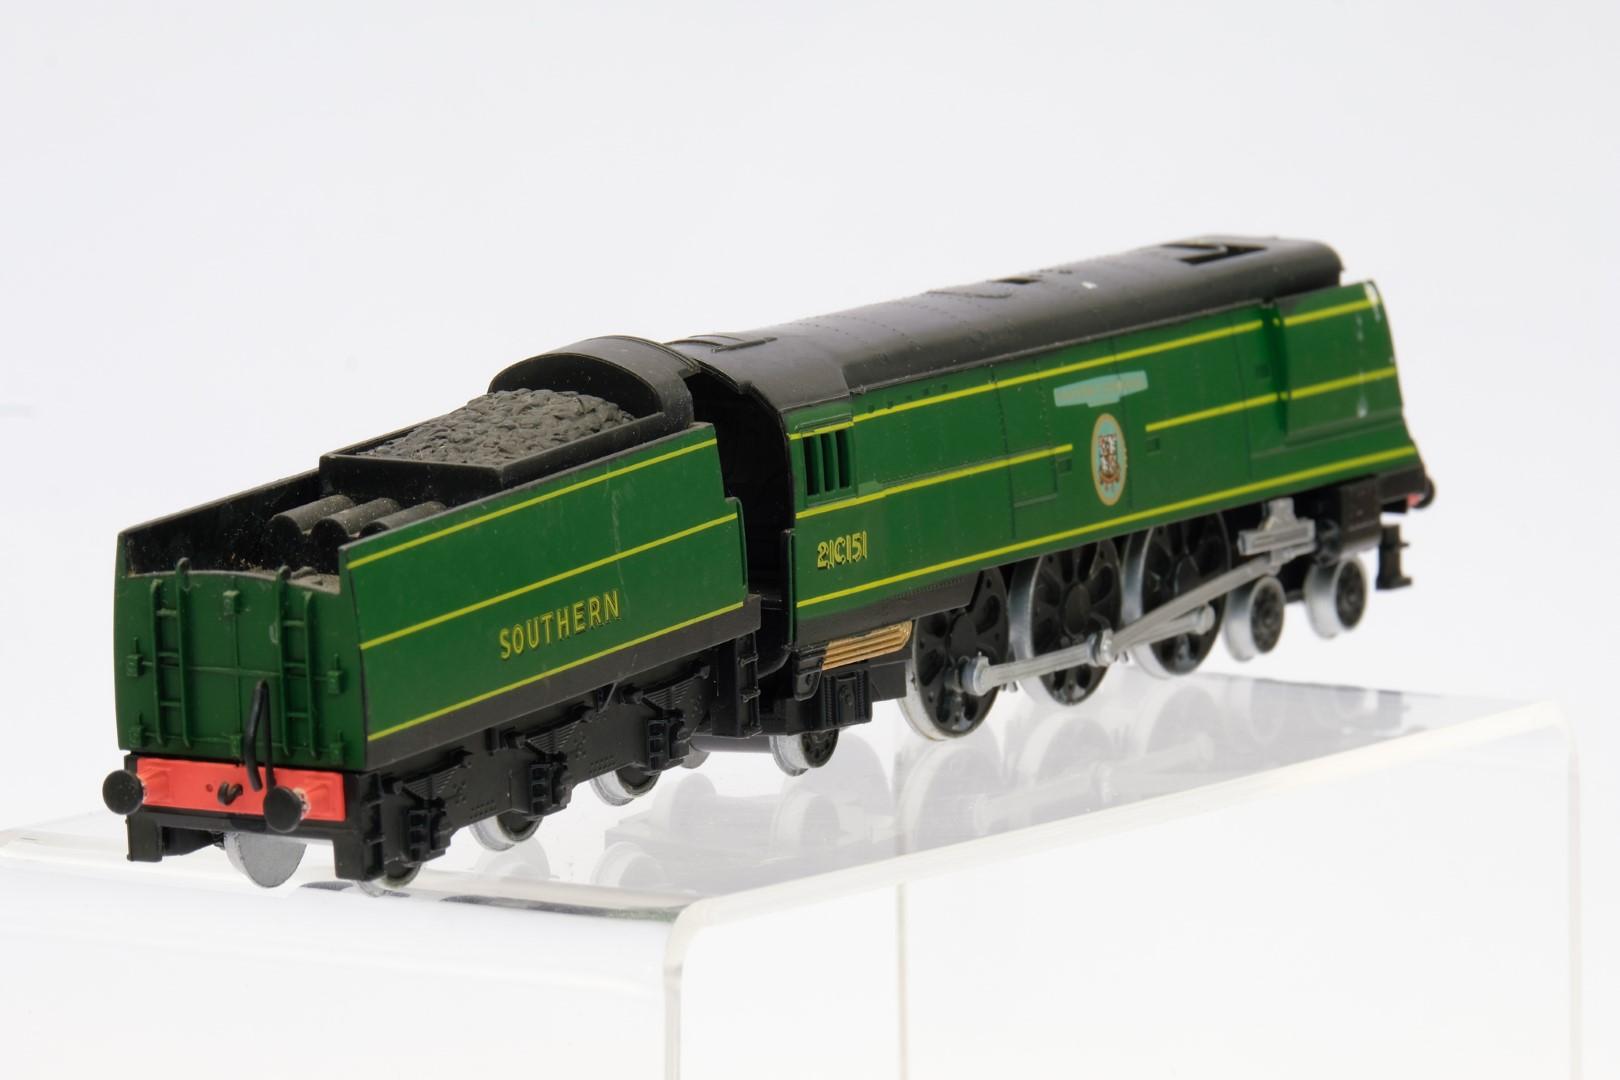 Winston Churchill Locomotive and Tender 21C151 - No Box - No Moving Parts - Image 3 of 4